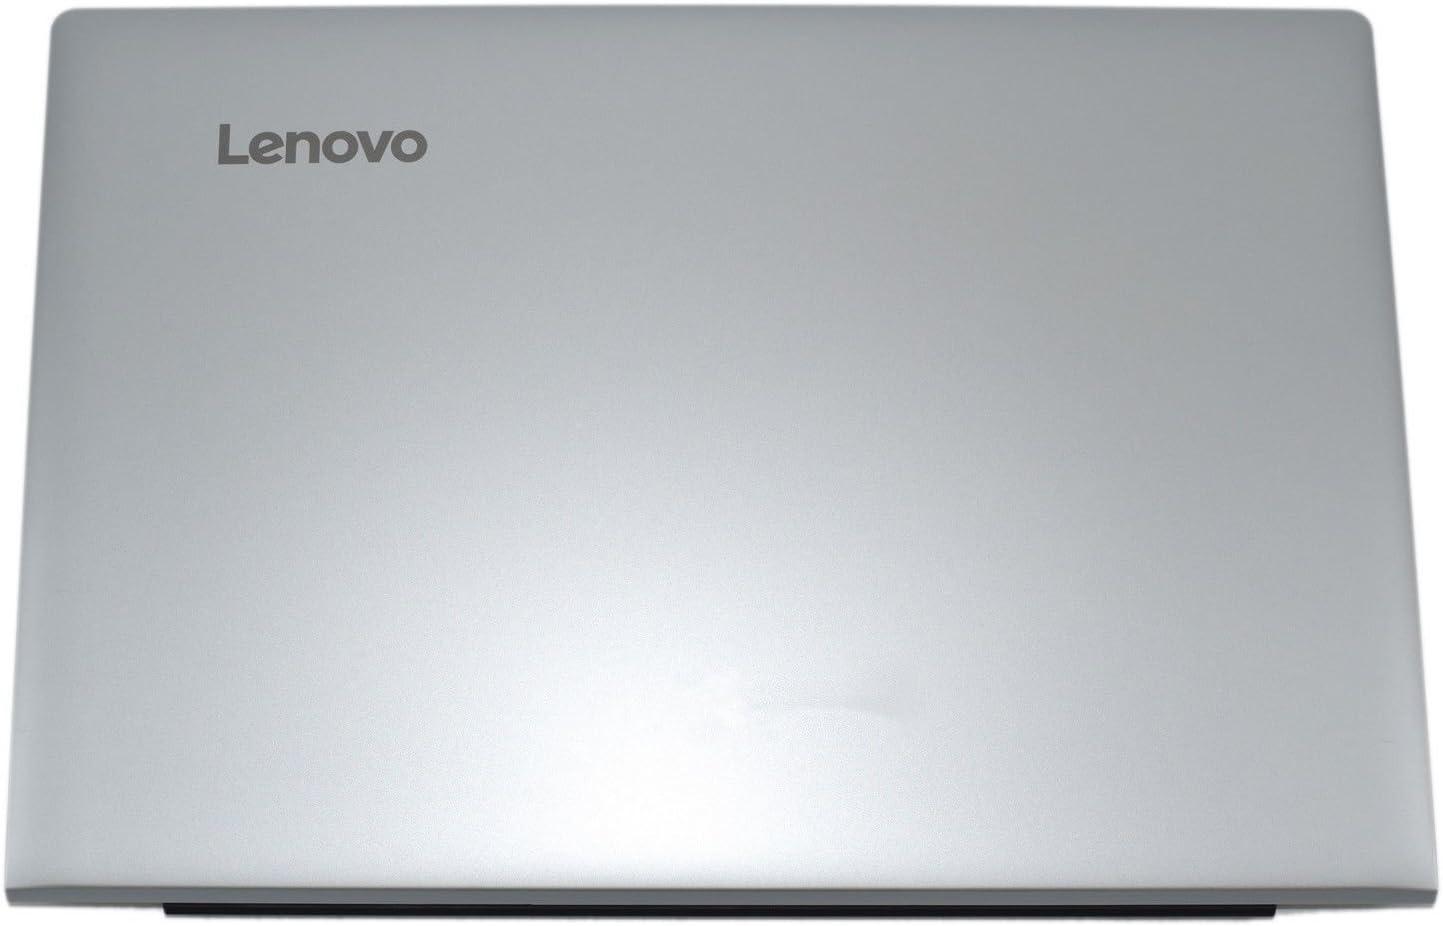 New for Lenovo Ideapad V310-15ISK V310-15 LCD Back Cover Rear Lid 3ELV7LCLV20 Silver